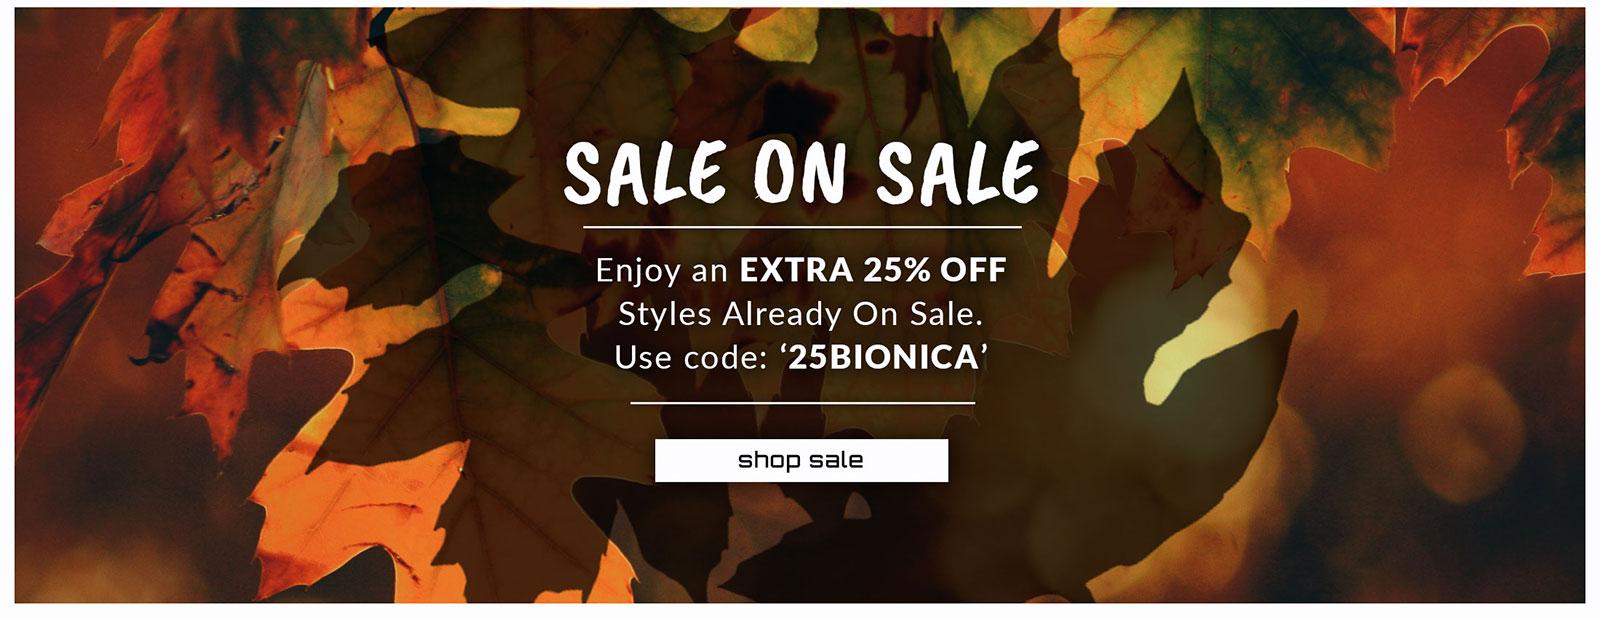 Sale on Sale. Enjoy an Extra 25% Off Styles Already on Sale. Use code: 25BIONICA.  Shop sale.